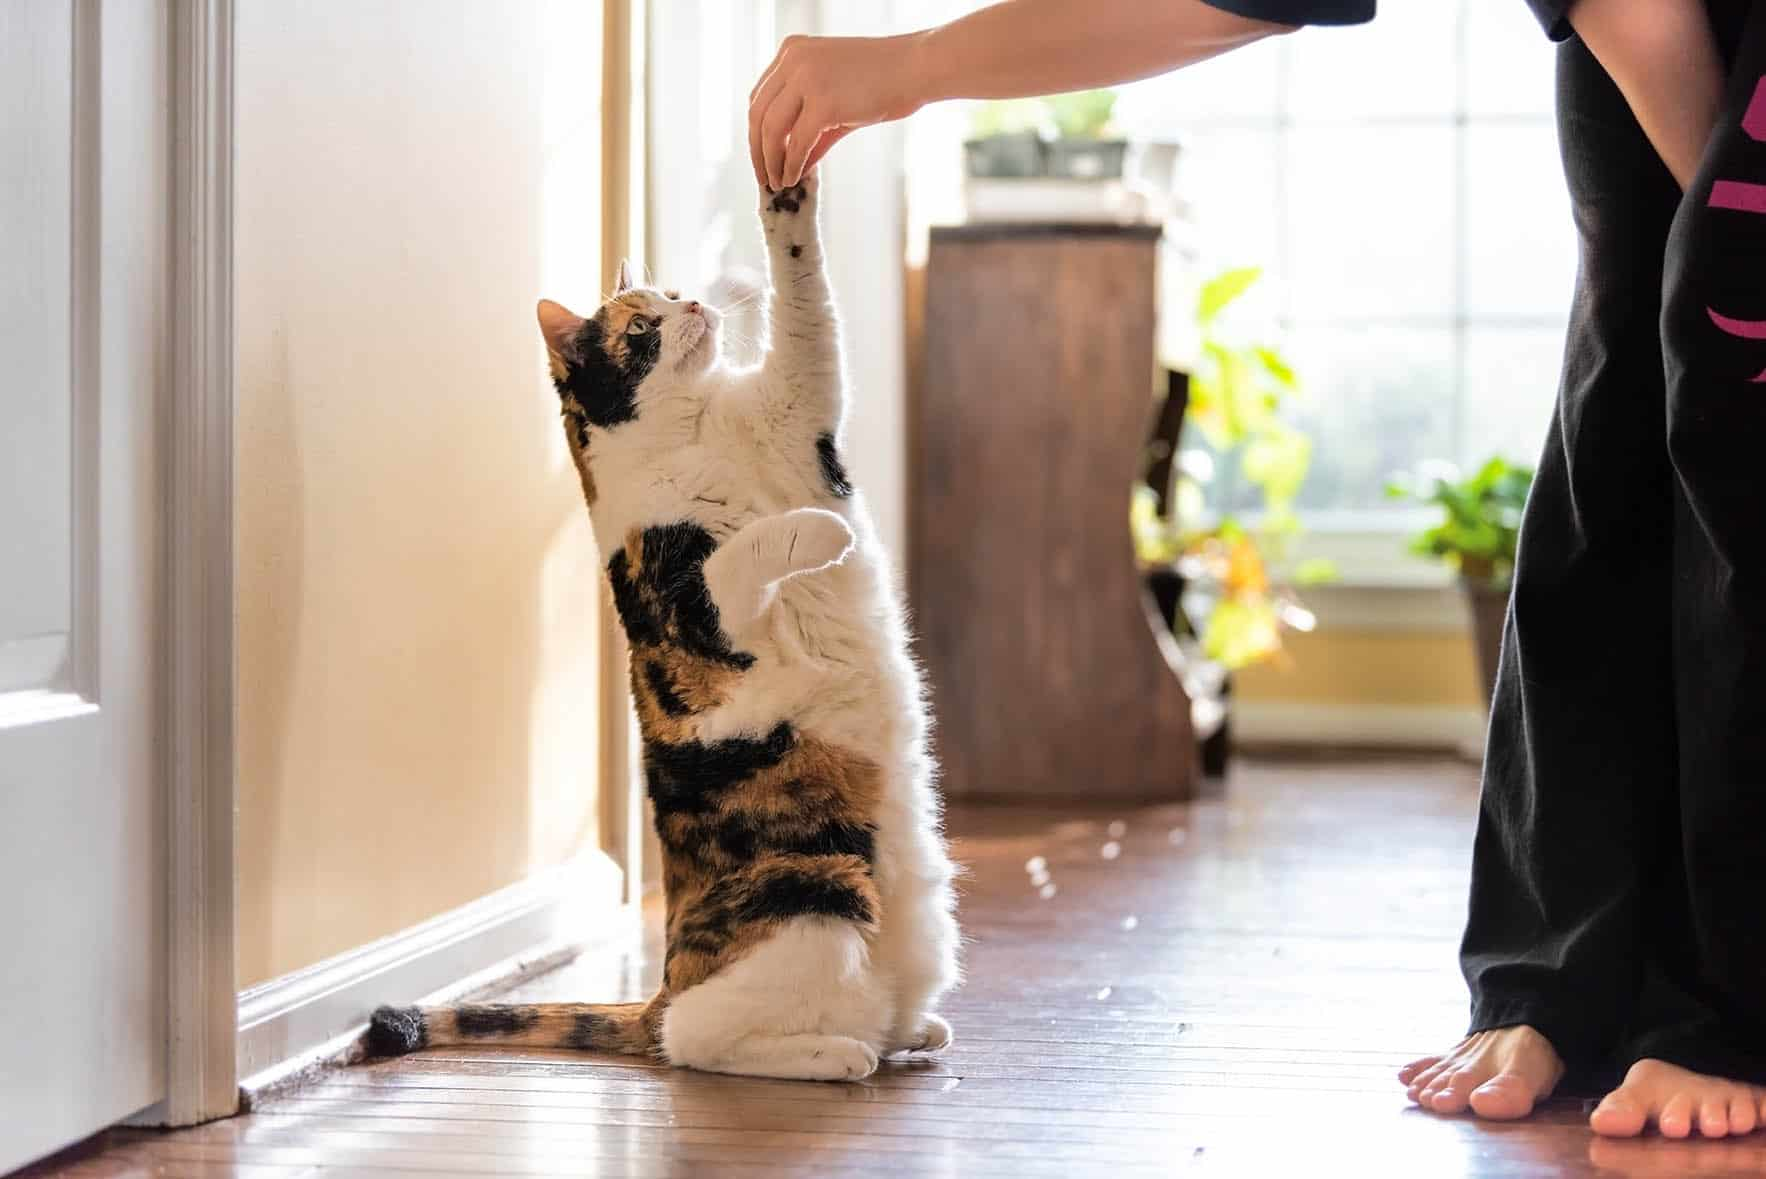 calico cat standing up_Andriy Blokhin, Shutterstock